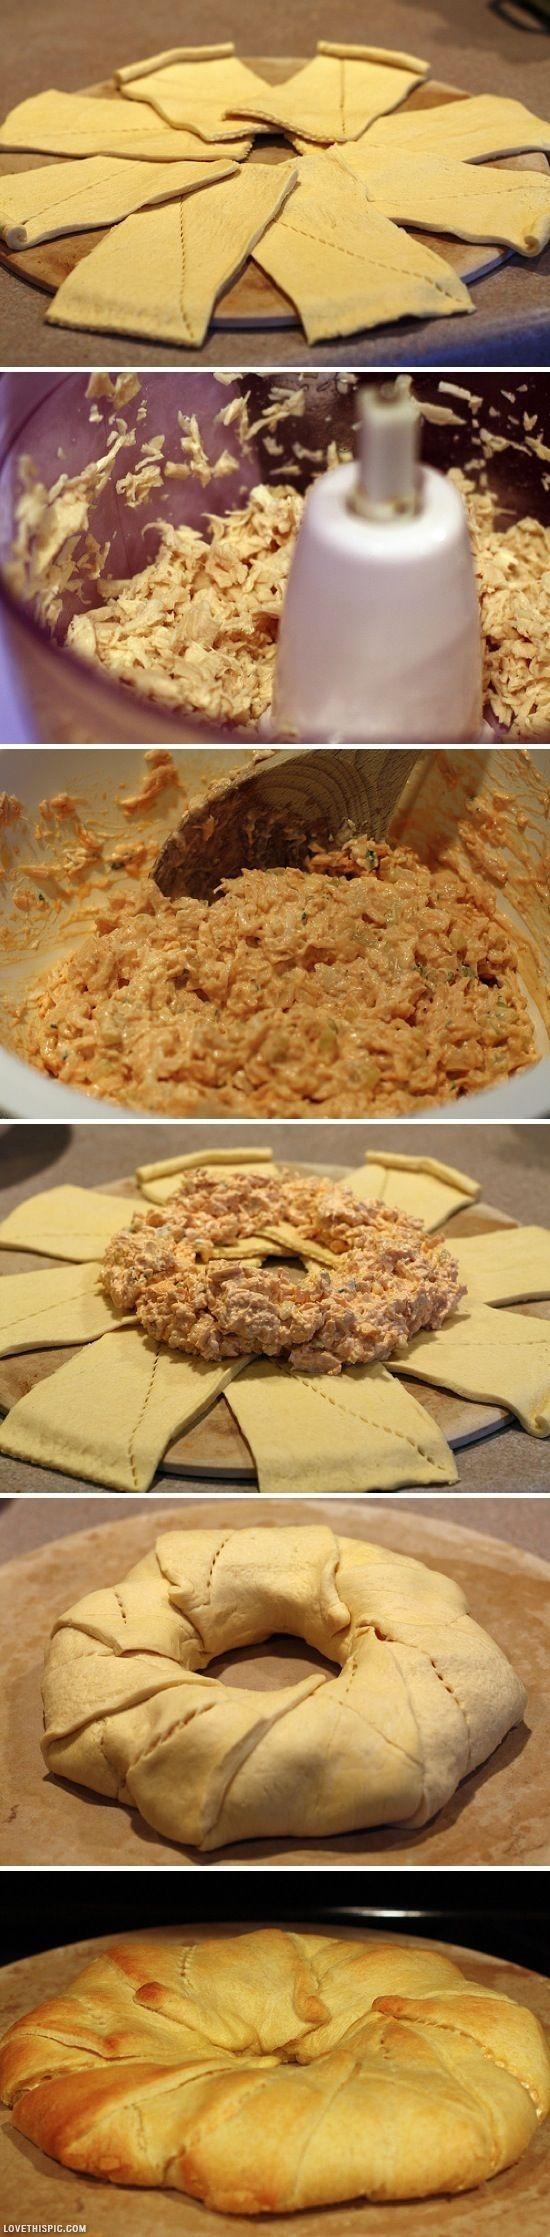 Buffalo Chicken Ring diy recipe recipes easy diy diy food diy baking